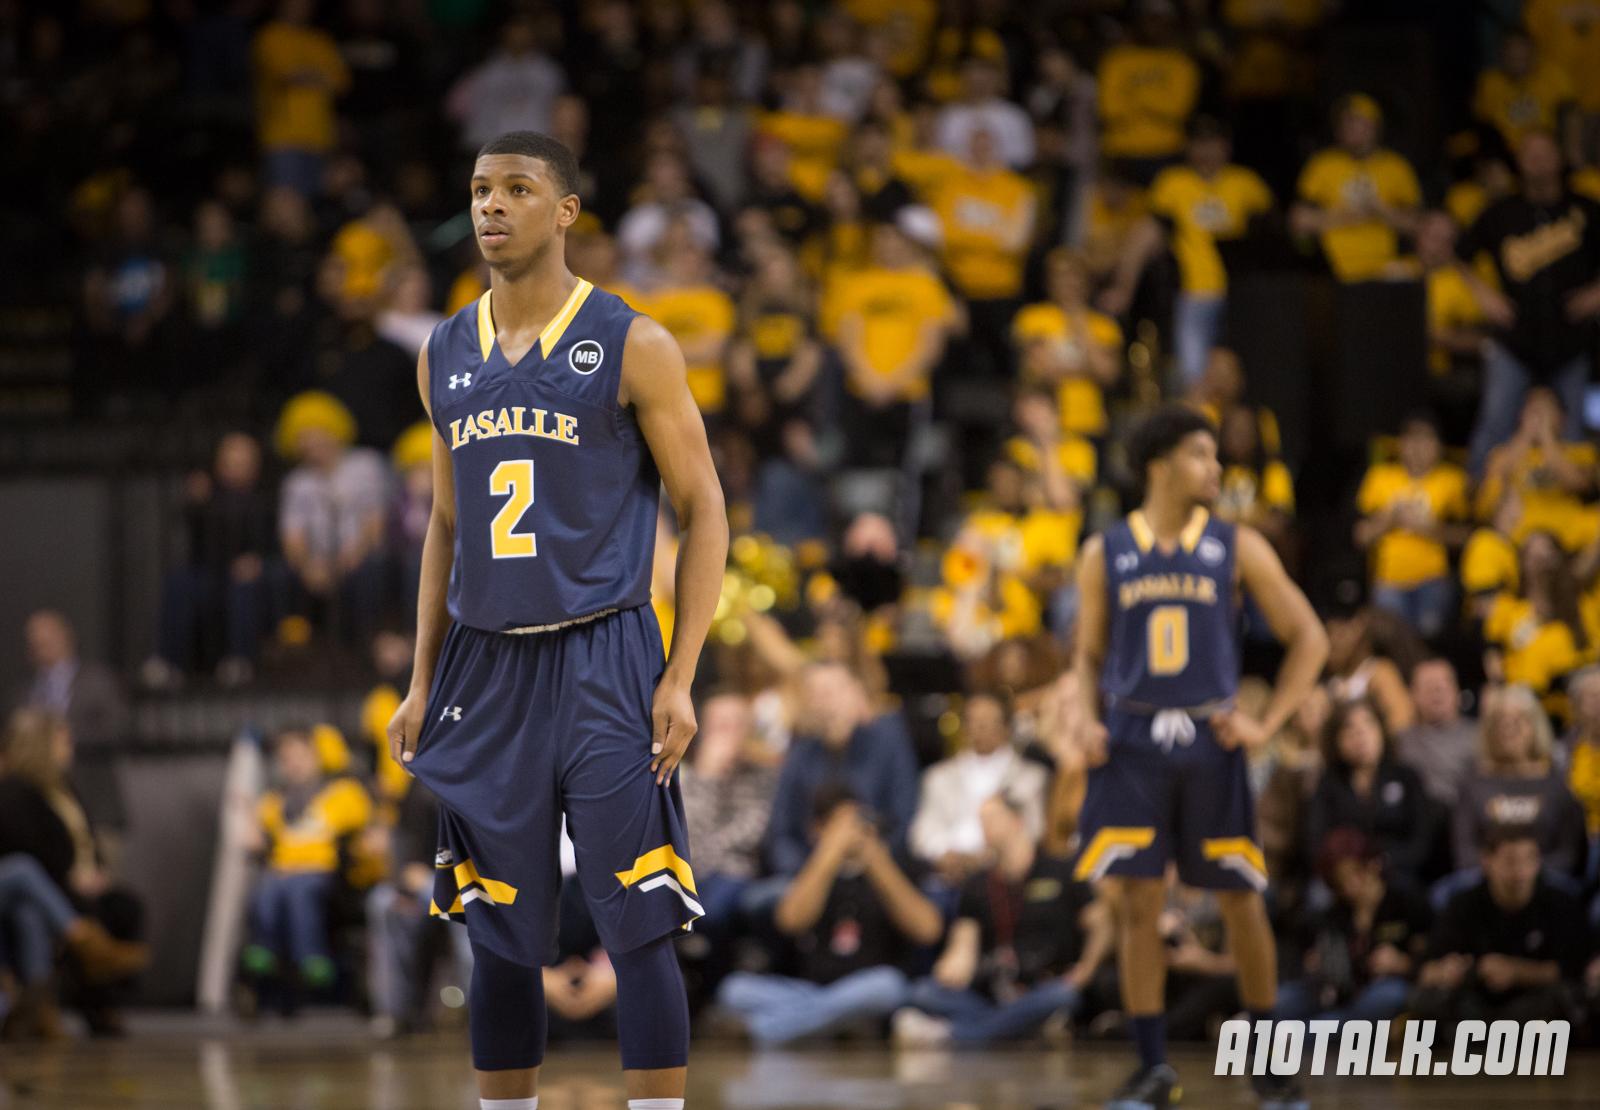 Kentucky Wildcats Basketball 2017 18 Season Preview: La Salle Explorers Basketball Full 2017-18 Season Preview